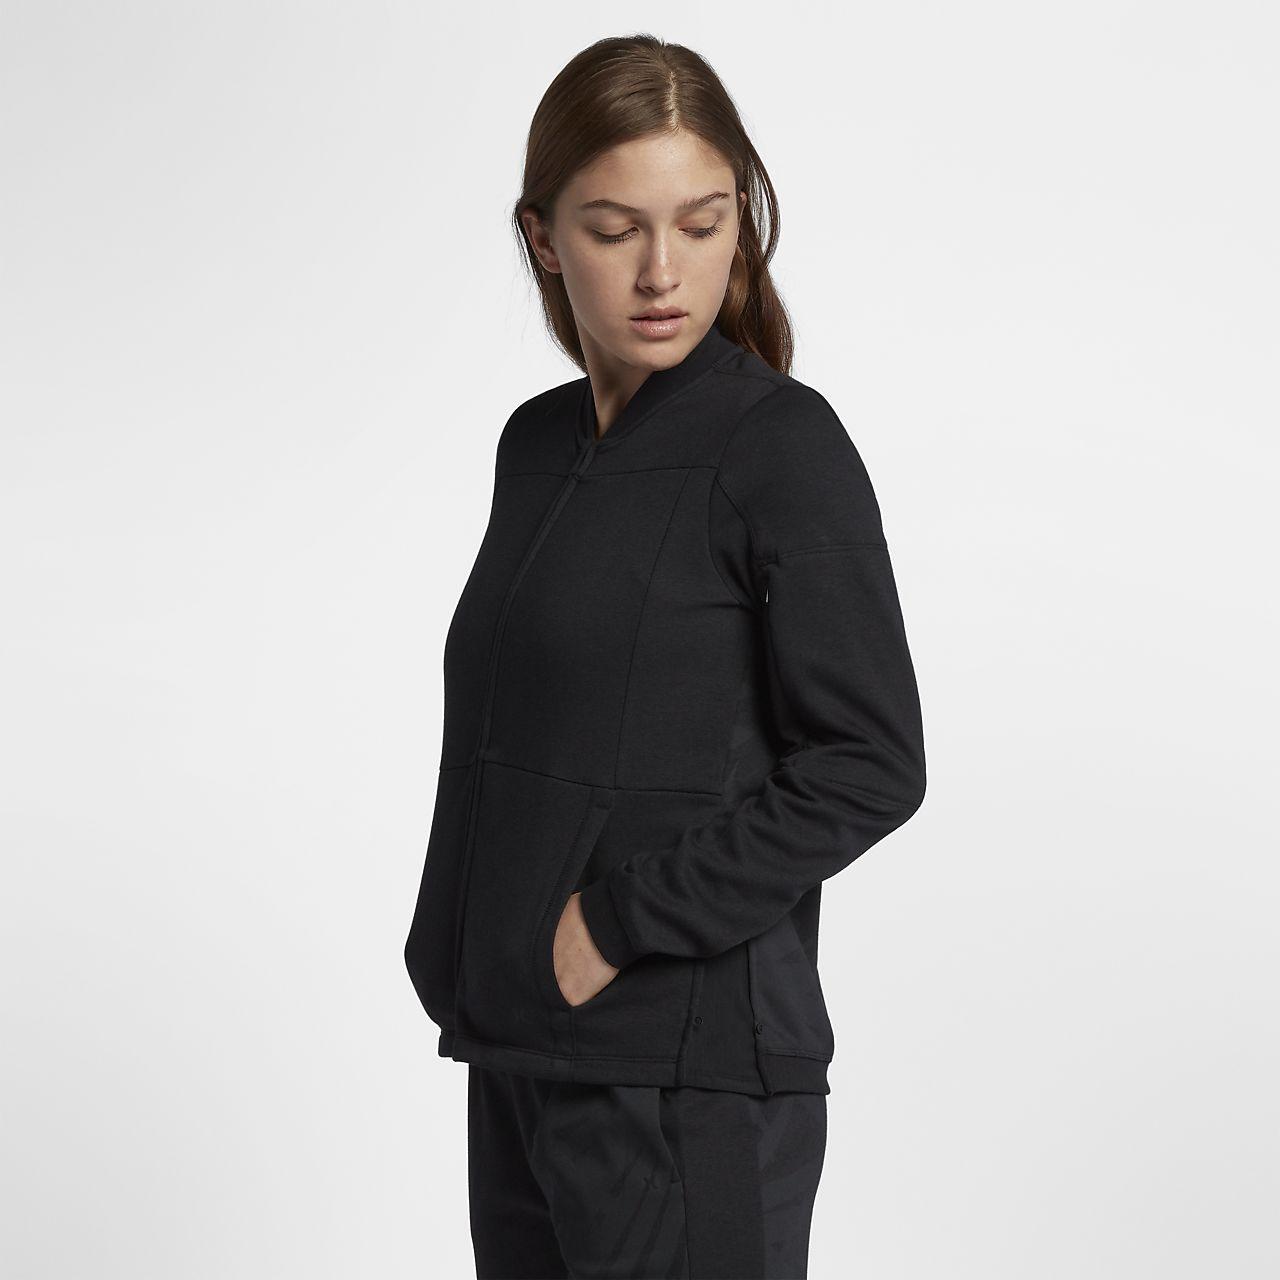 60a51f644546 Hurley Palmer Bomber Women s Fleece Jacket. Nike.com HR